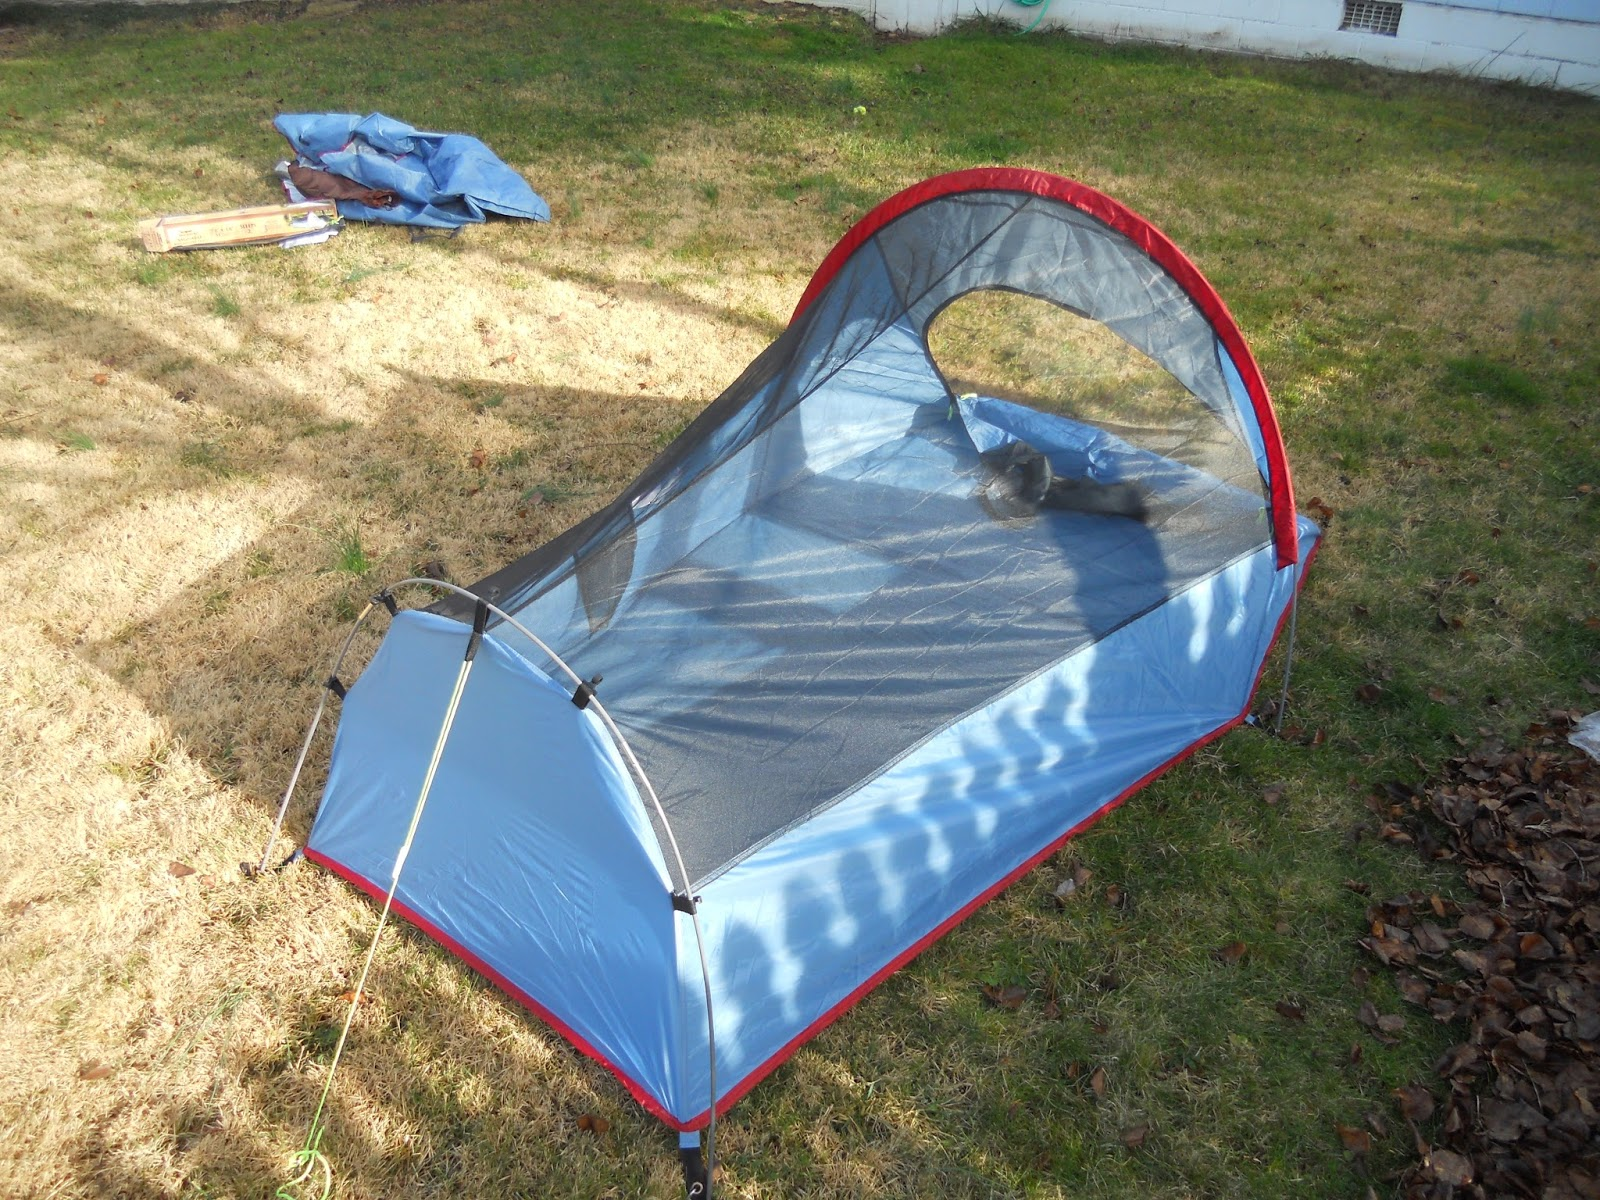 Texsport Saguaro Bivy Shelter Tent from Starboard Side Looking Forward & Texsport Saguaro Bivy Shelter Tent: Texsport Saguaro Bivy Shelter ...